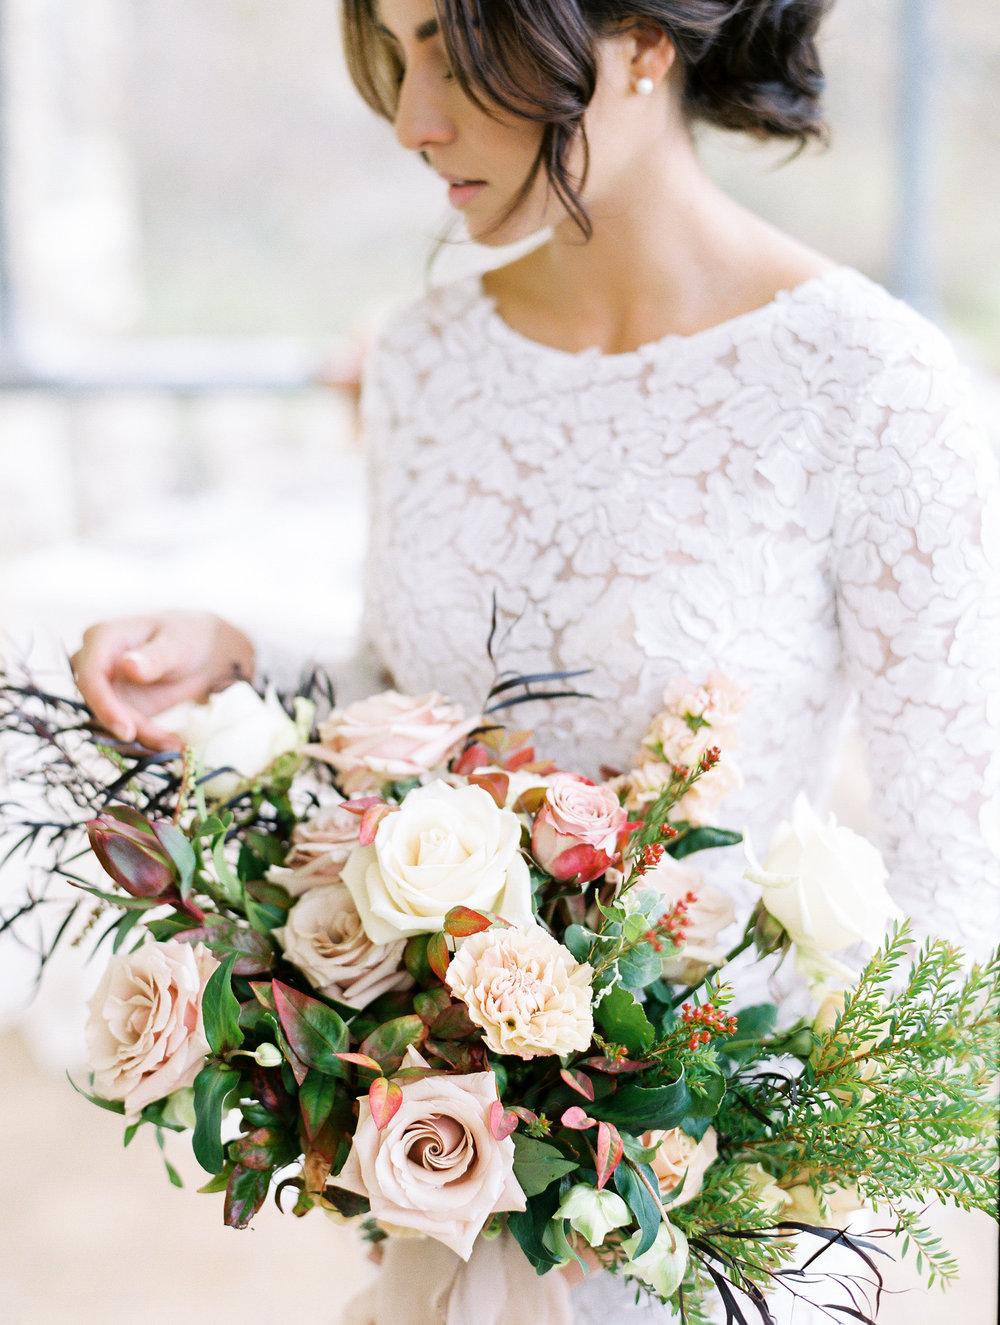 sandra-chau-stylist-floral-florist-branding-lifestyle-shoot-we-are-origami056.jpg